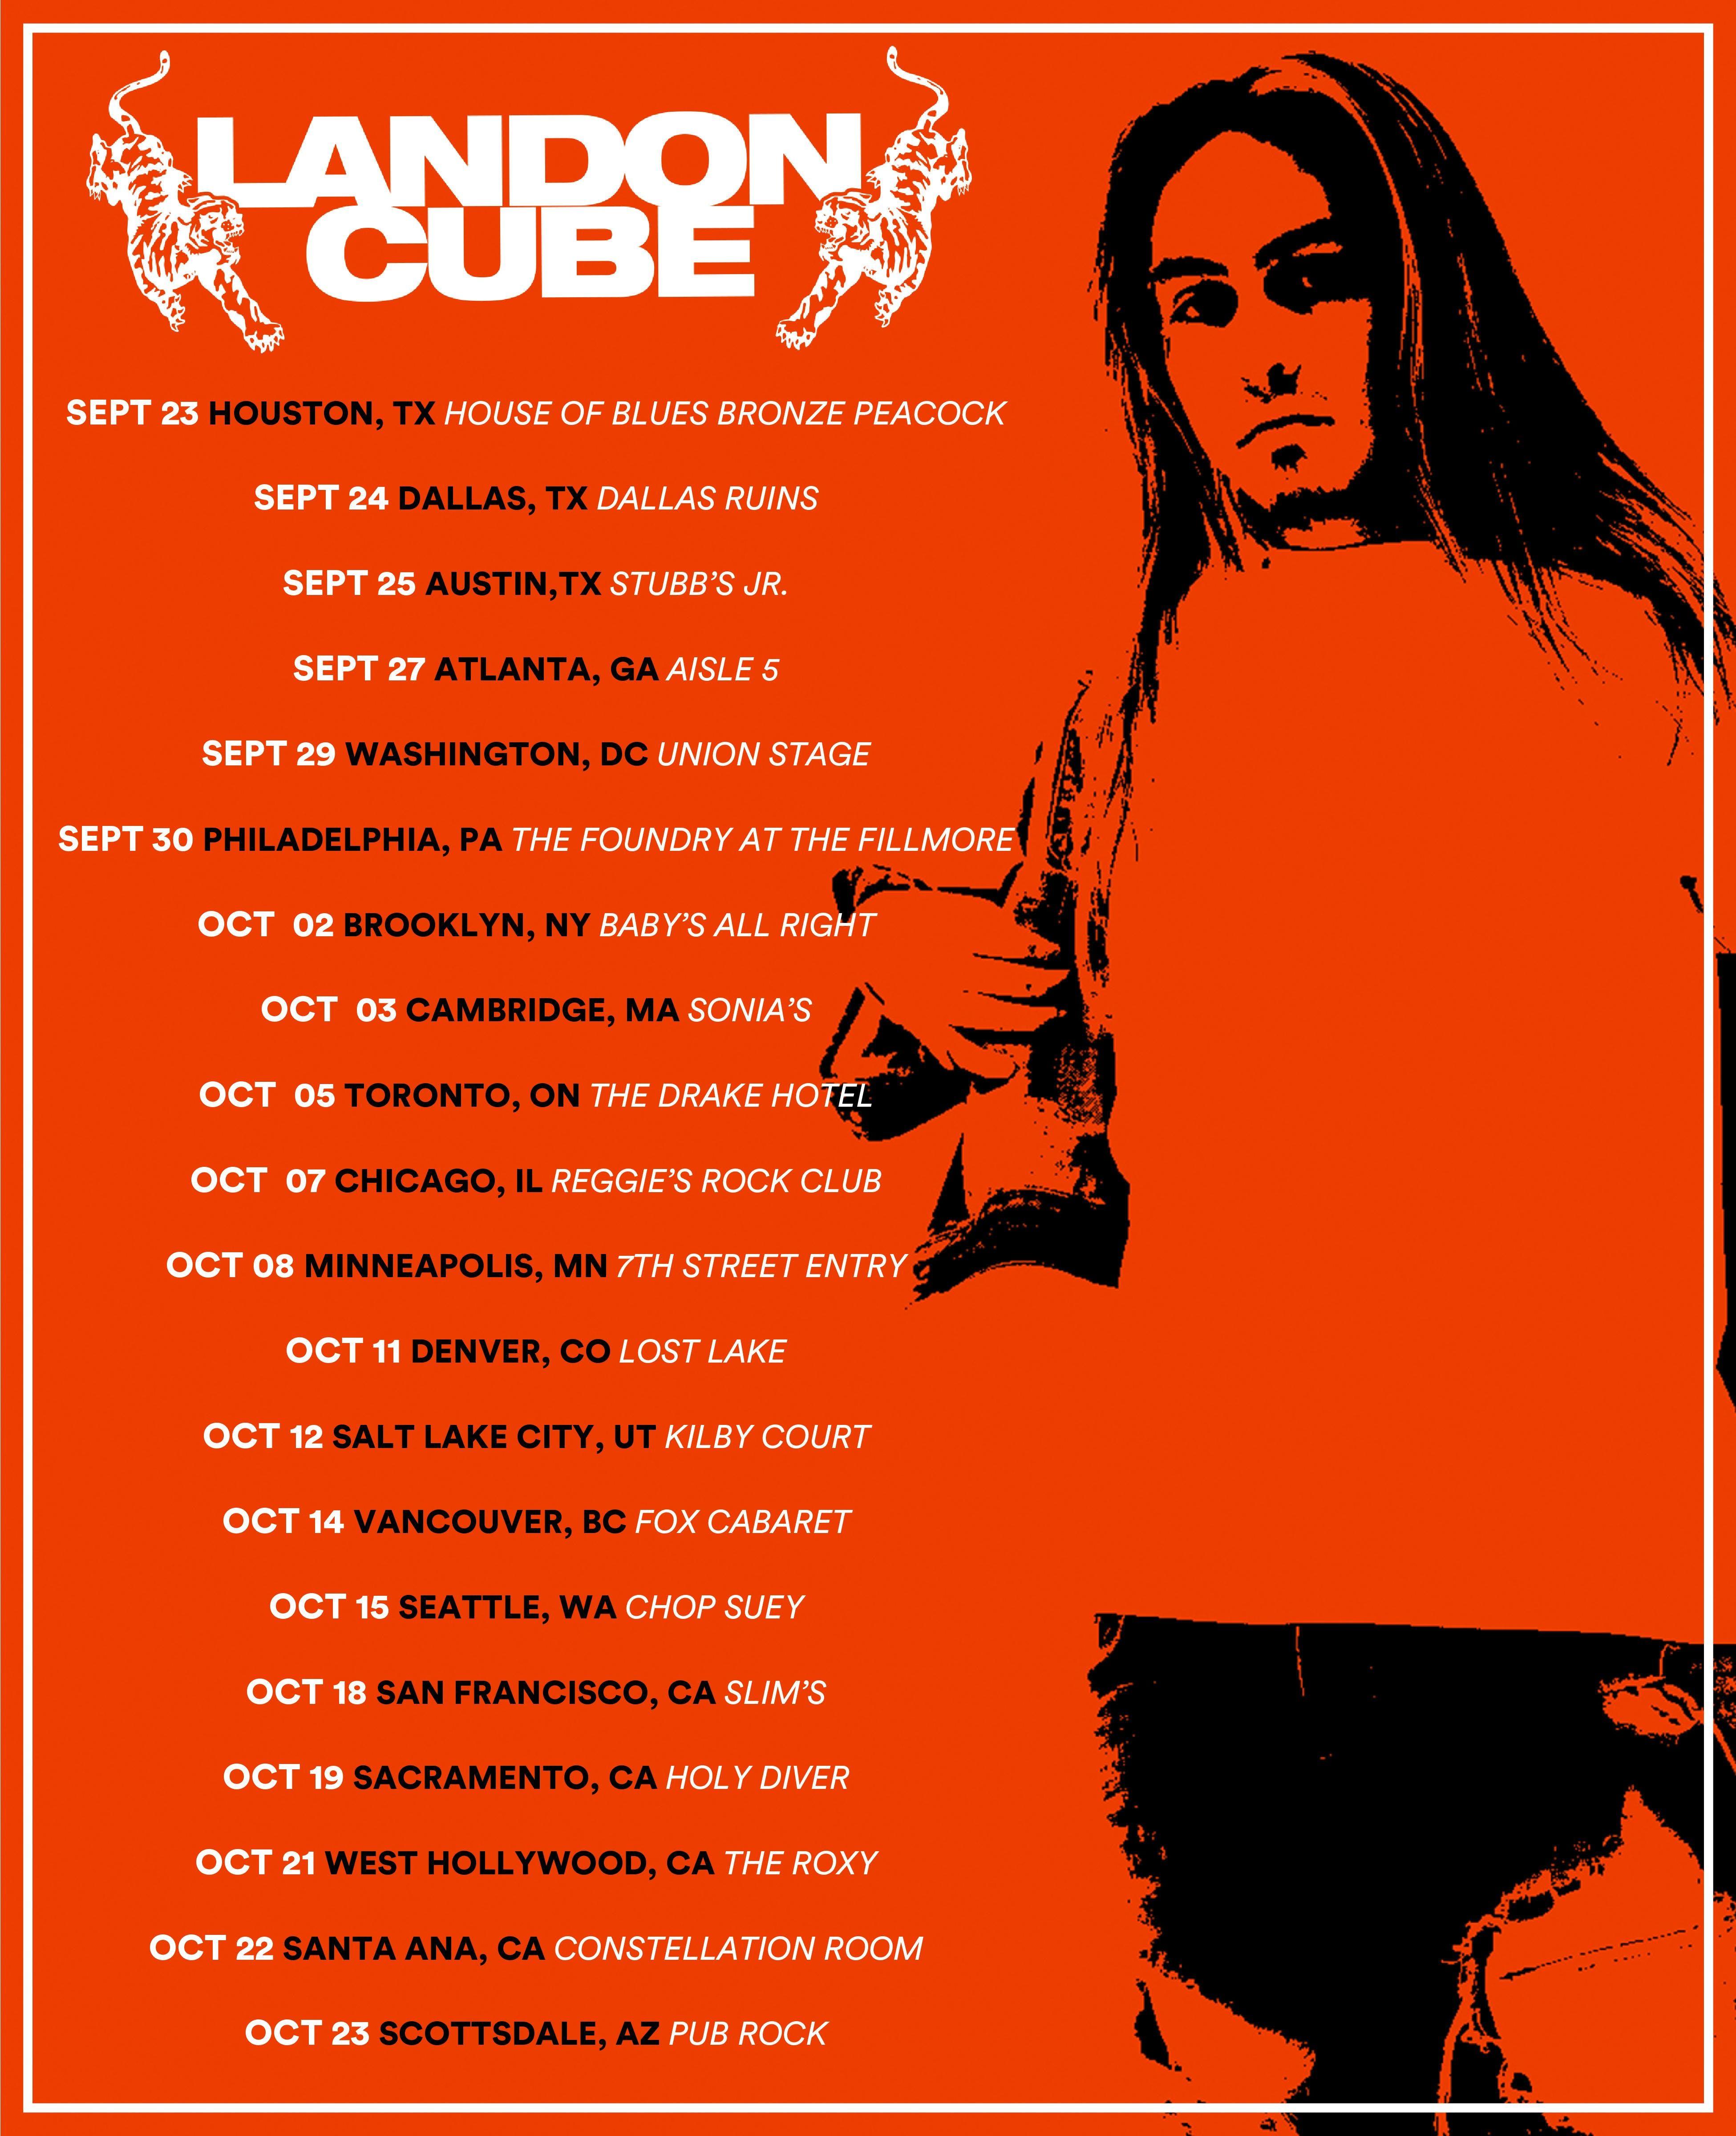 Scottsdale, AZ - VIP Meet + Greet UPGRADE ONLY Landon Cube Orange Tour